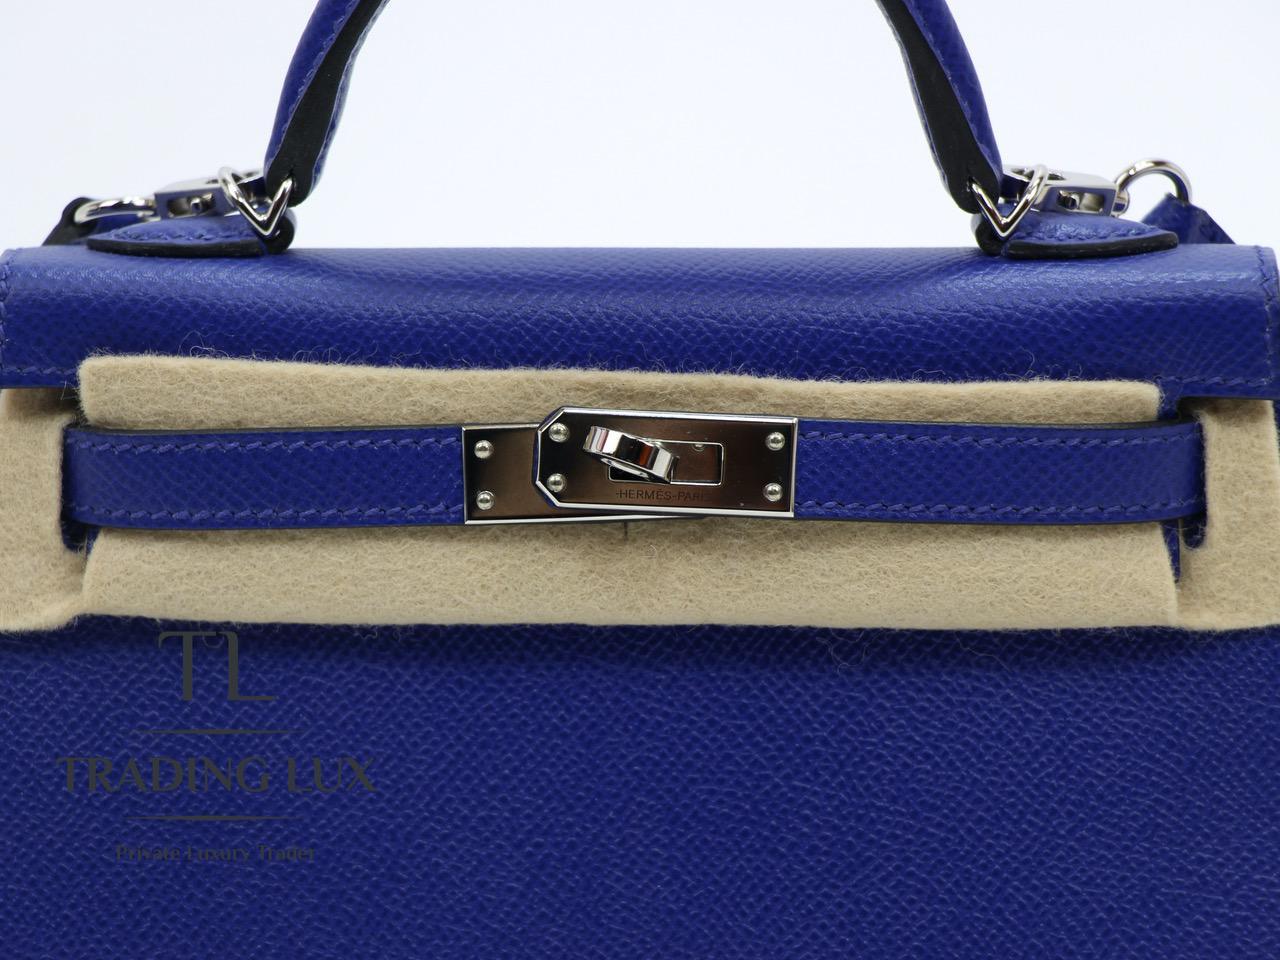 ermès-Mini-Kelly-20-Blue-Electric-3-1